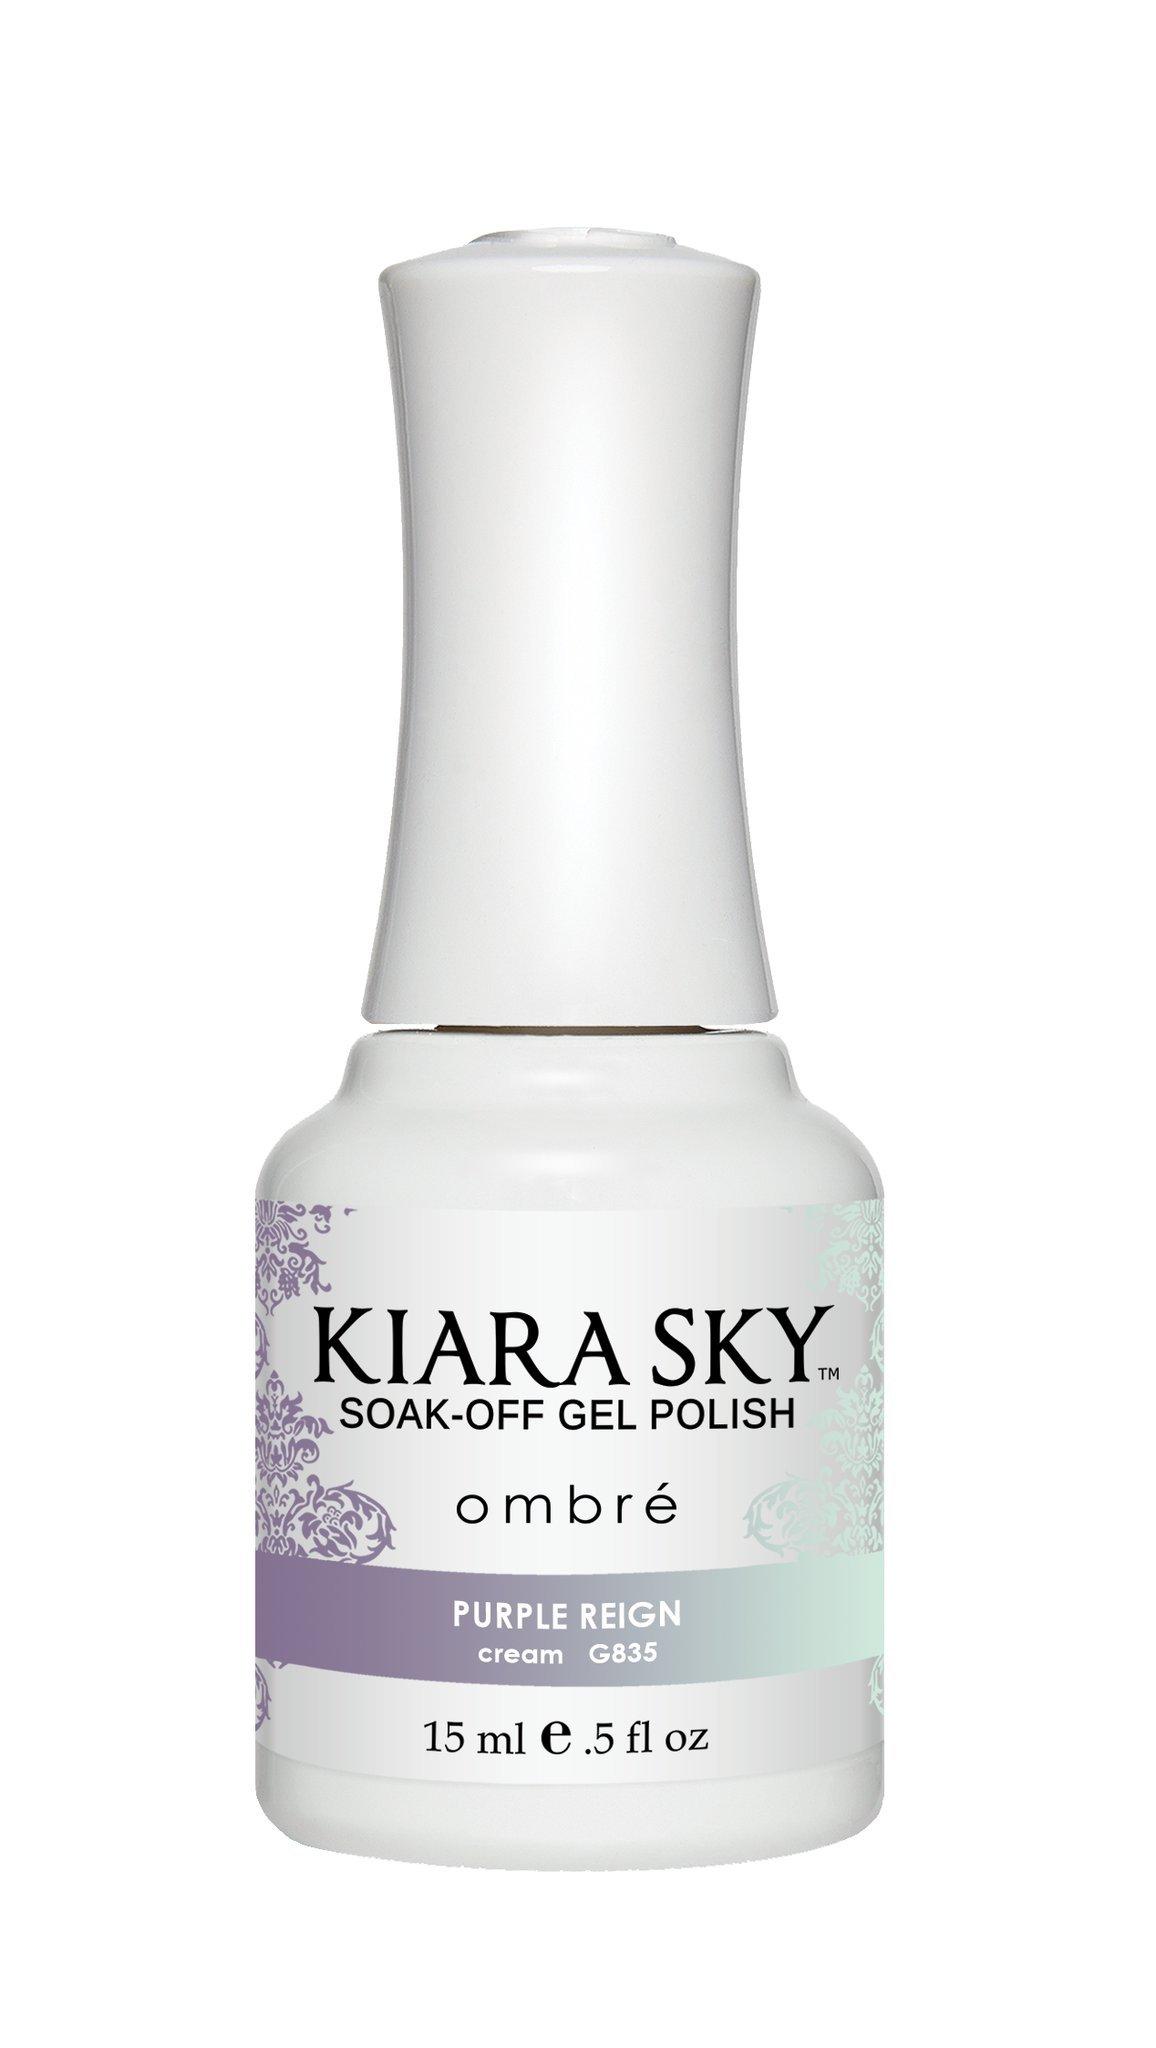 Amazon.com : Kiara Sky Gel Polish, Pinkarella Ombre, 15 Gram : Beauty